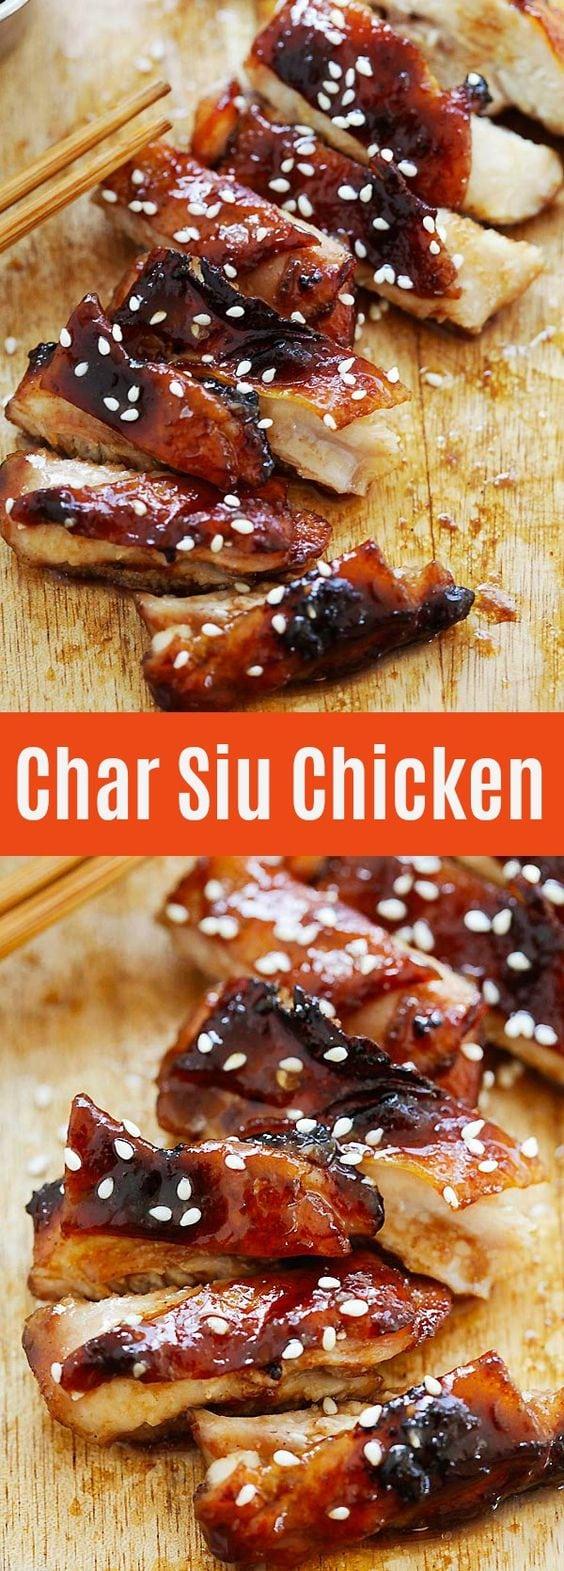 Char Siu Chicken Recipe